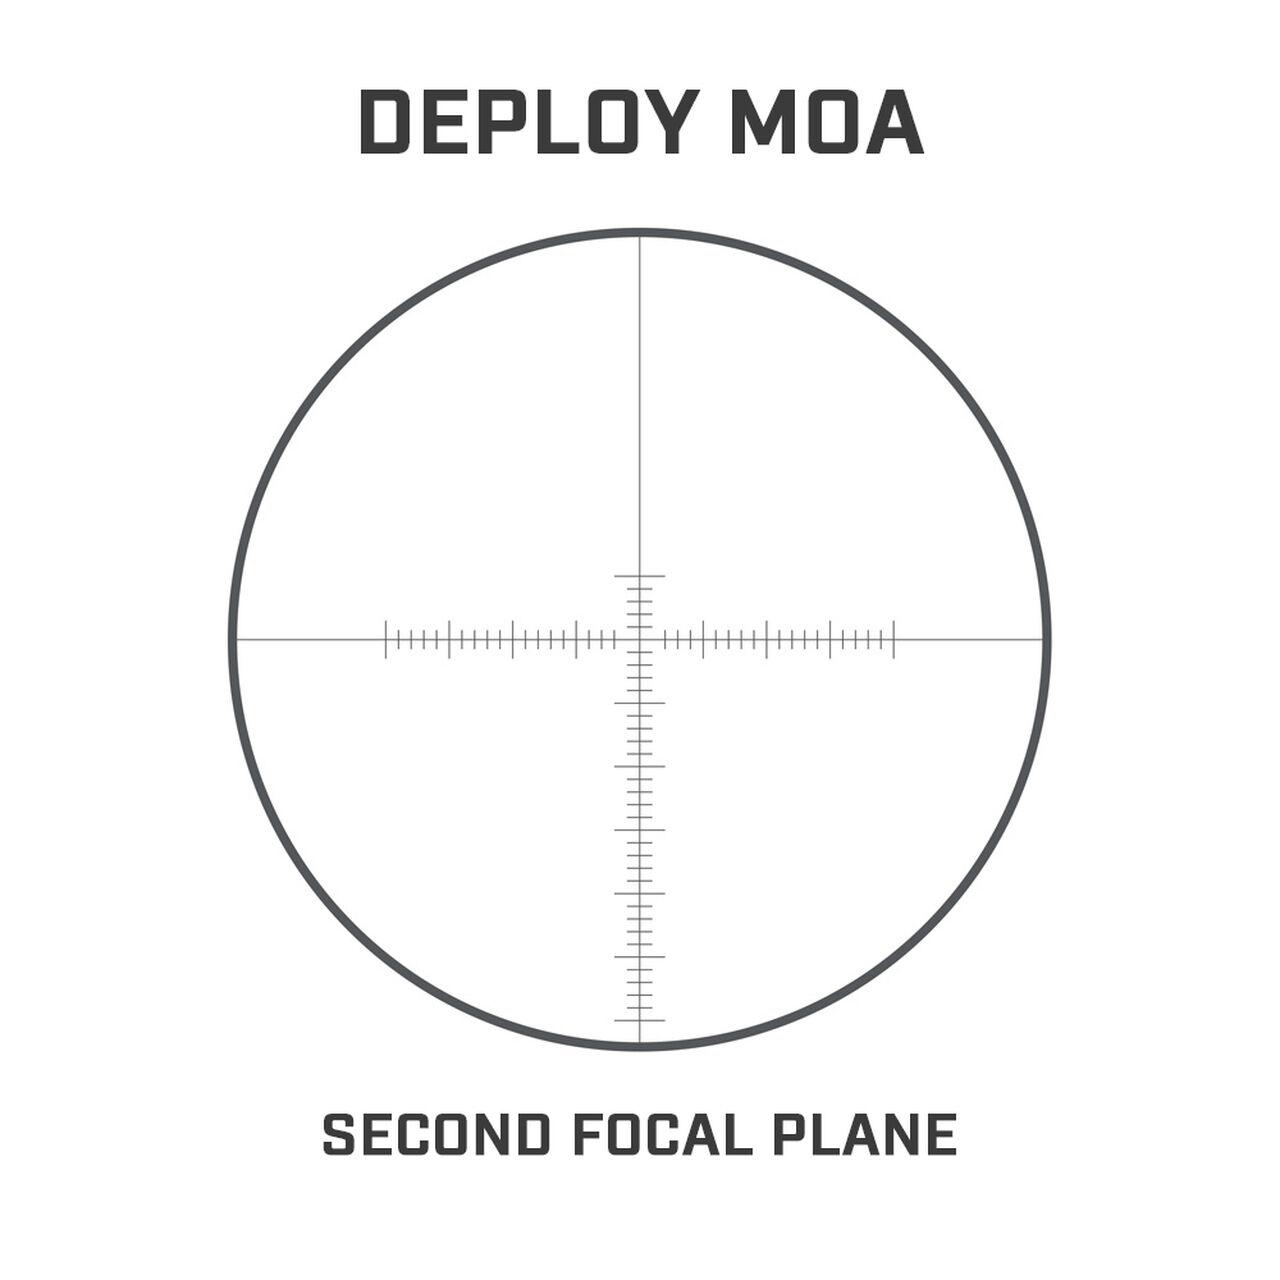 Bushnell Engage 3-9x40 SFP Deploy MOA